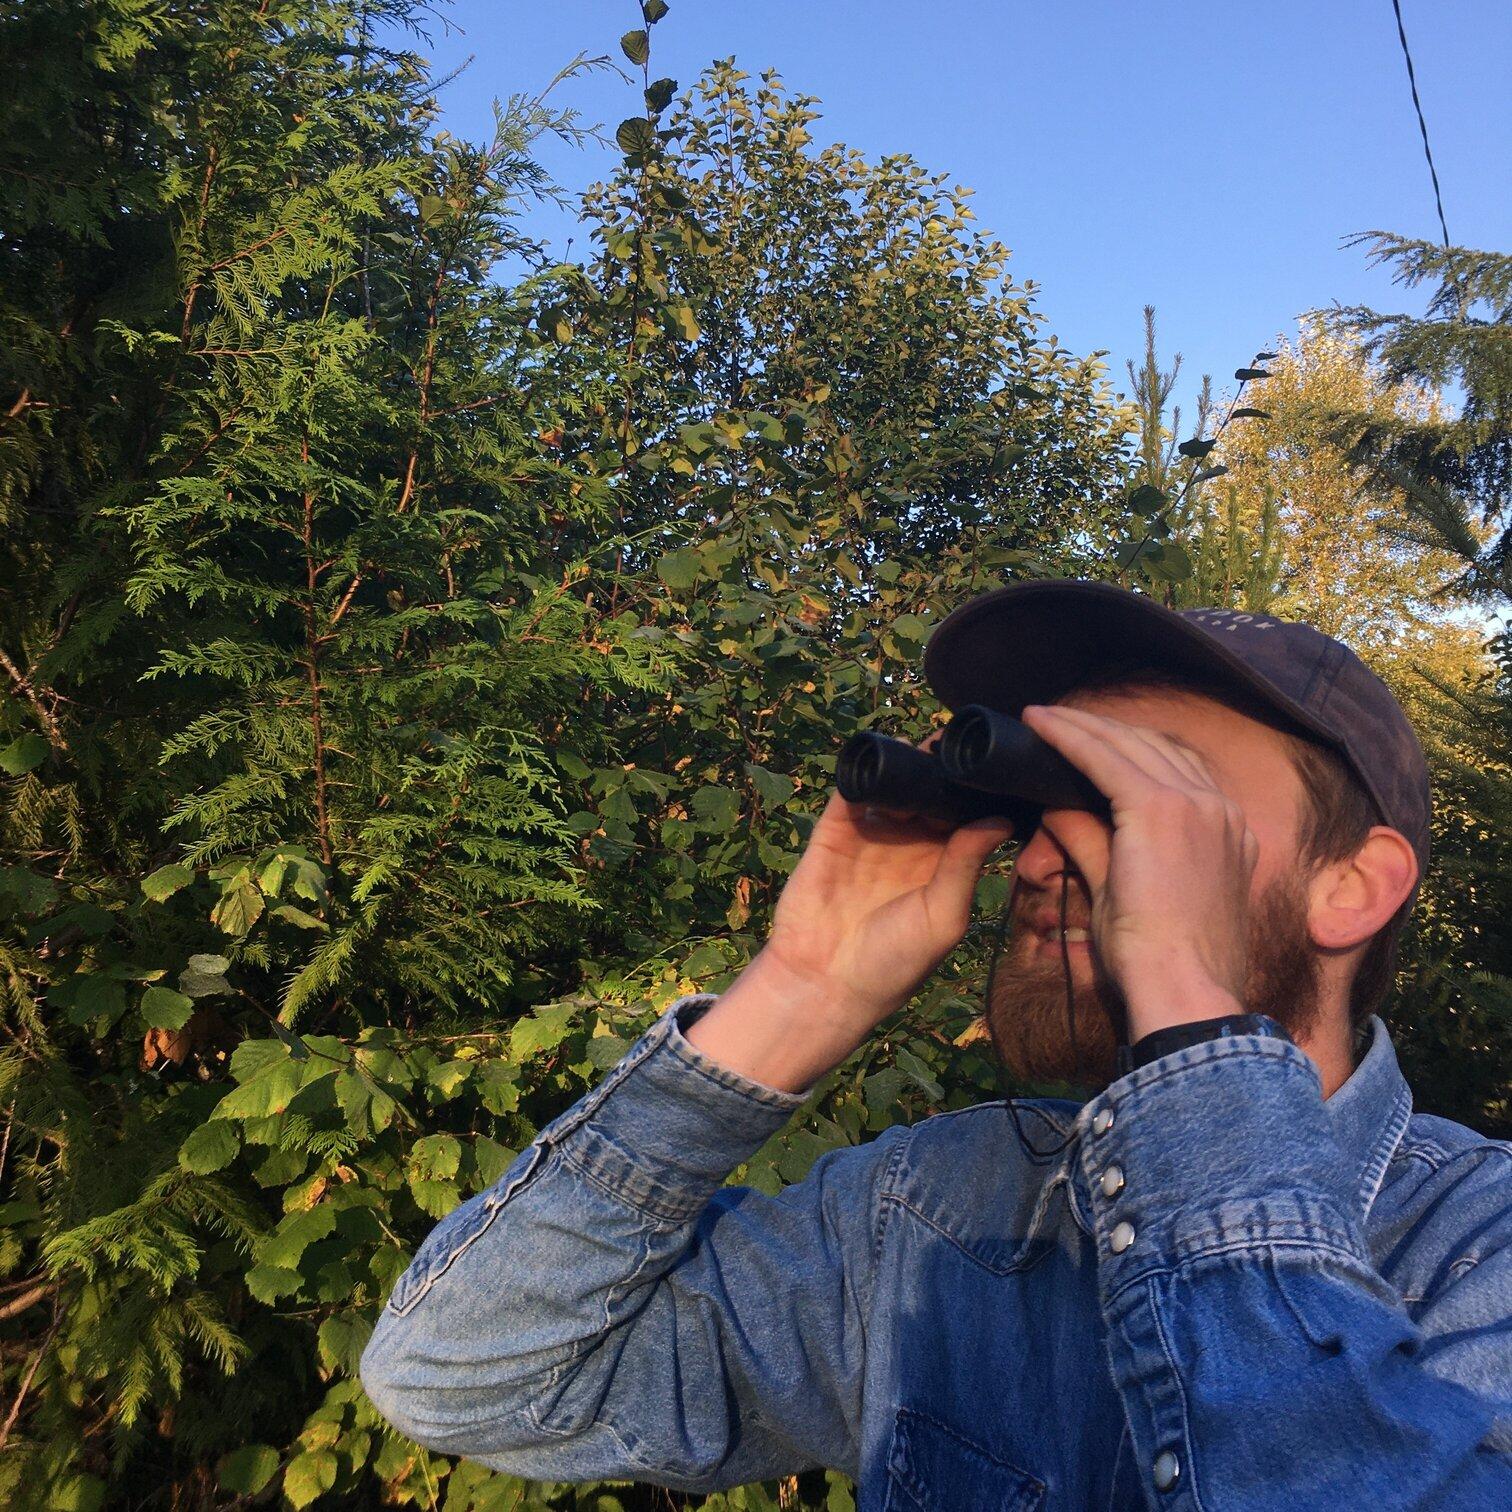 Birdwatching man at Alderbrook Resort